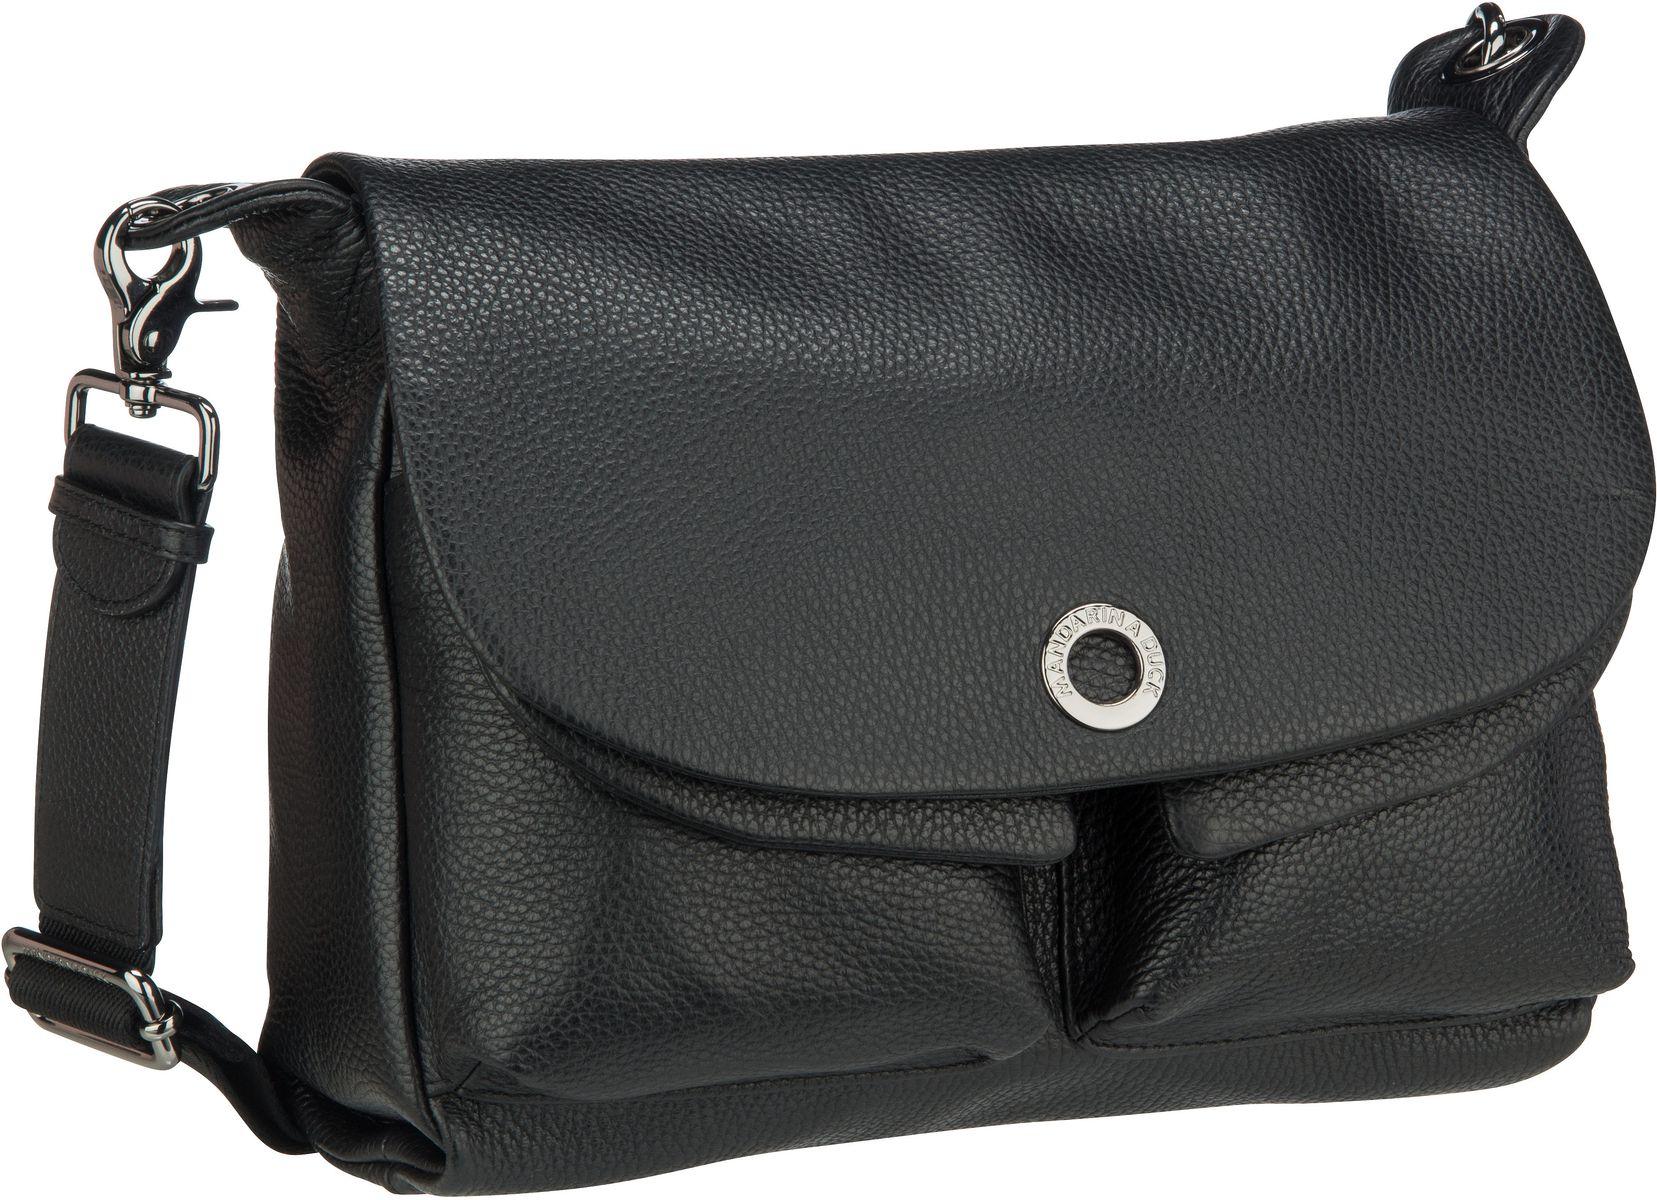 Umhängetasche Mellow Leather Shoulder Bag FZT23 Nero